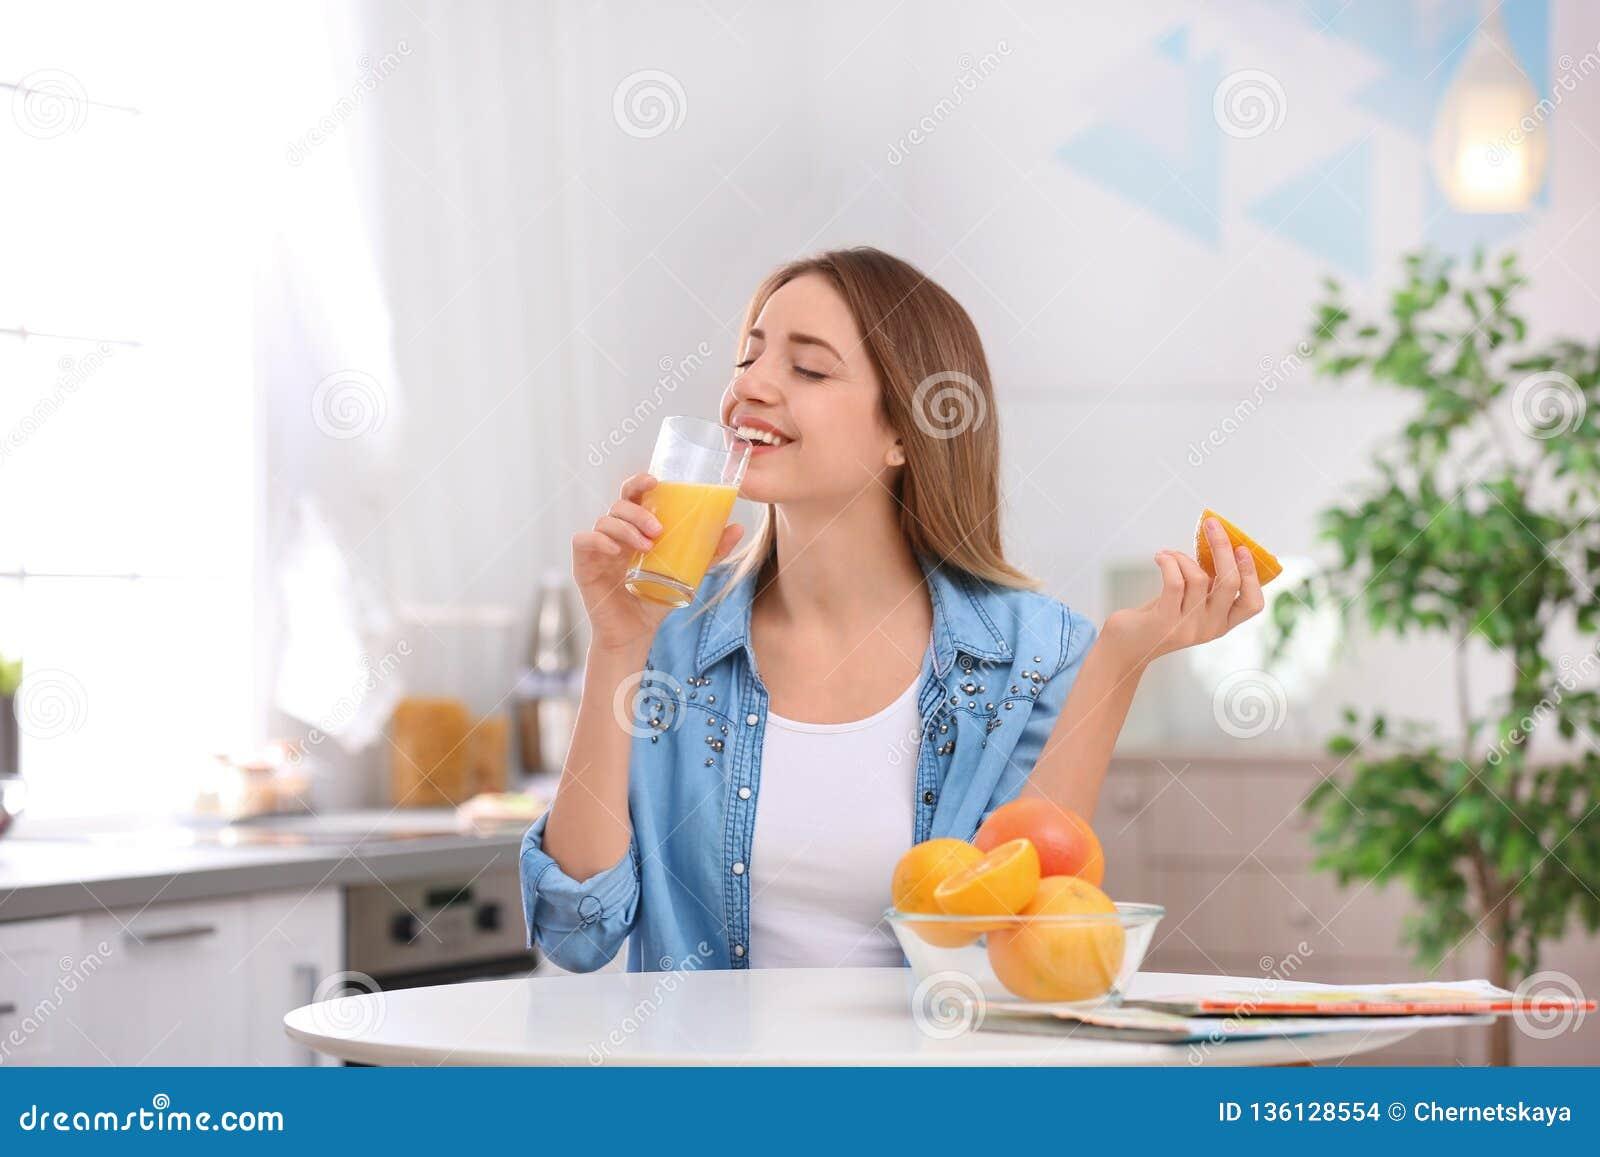 Beautiful young woman drinking fresh orange juice in kitchen